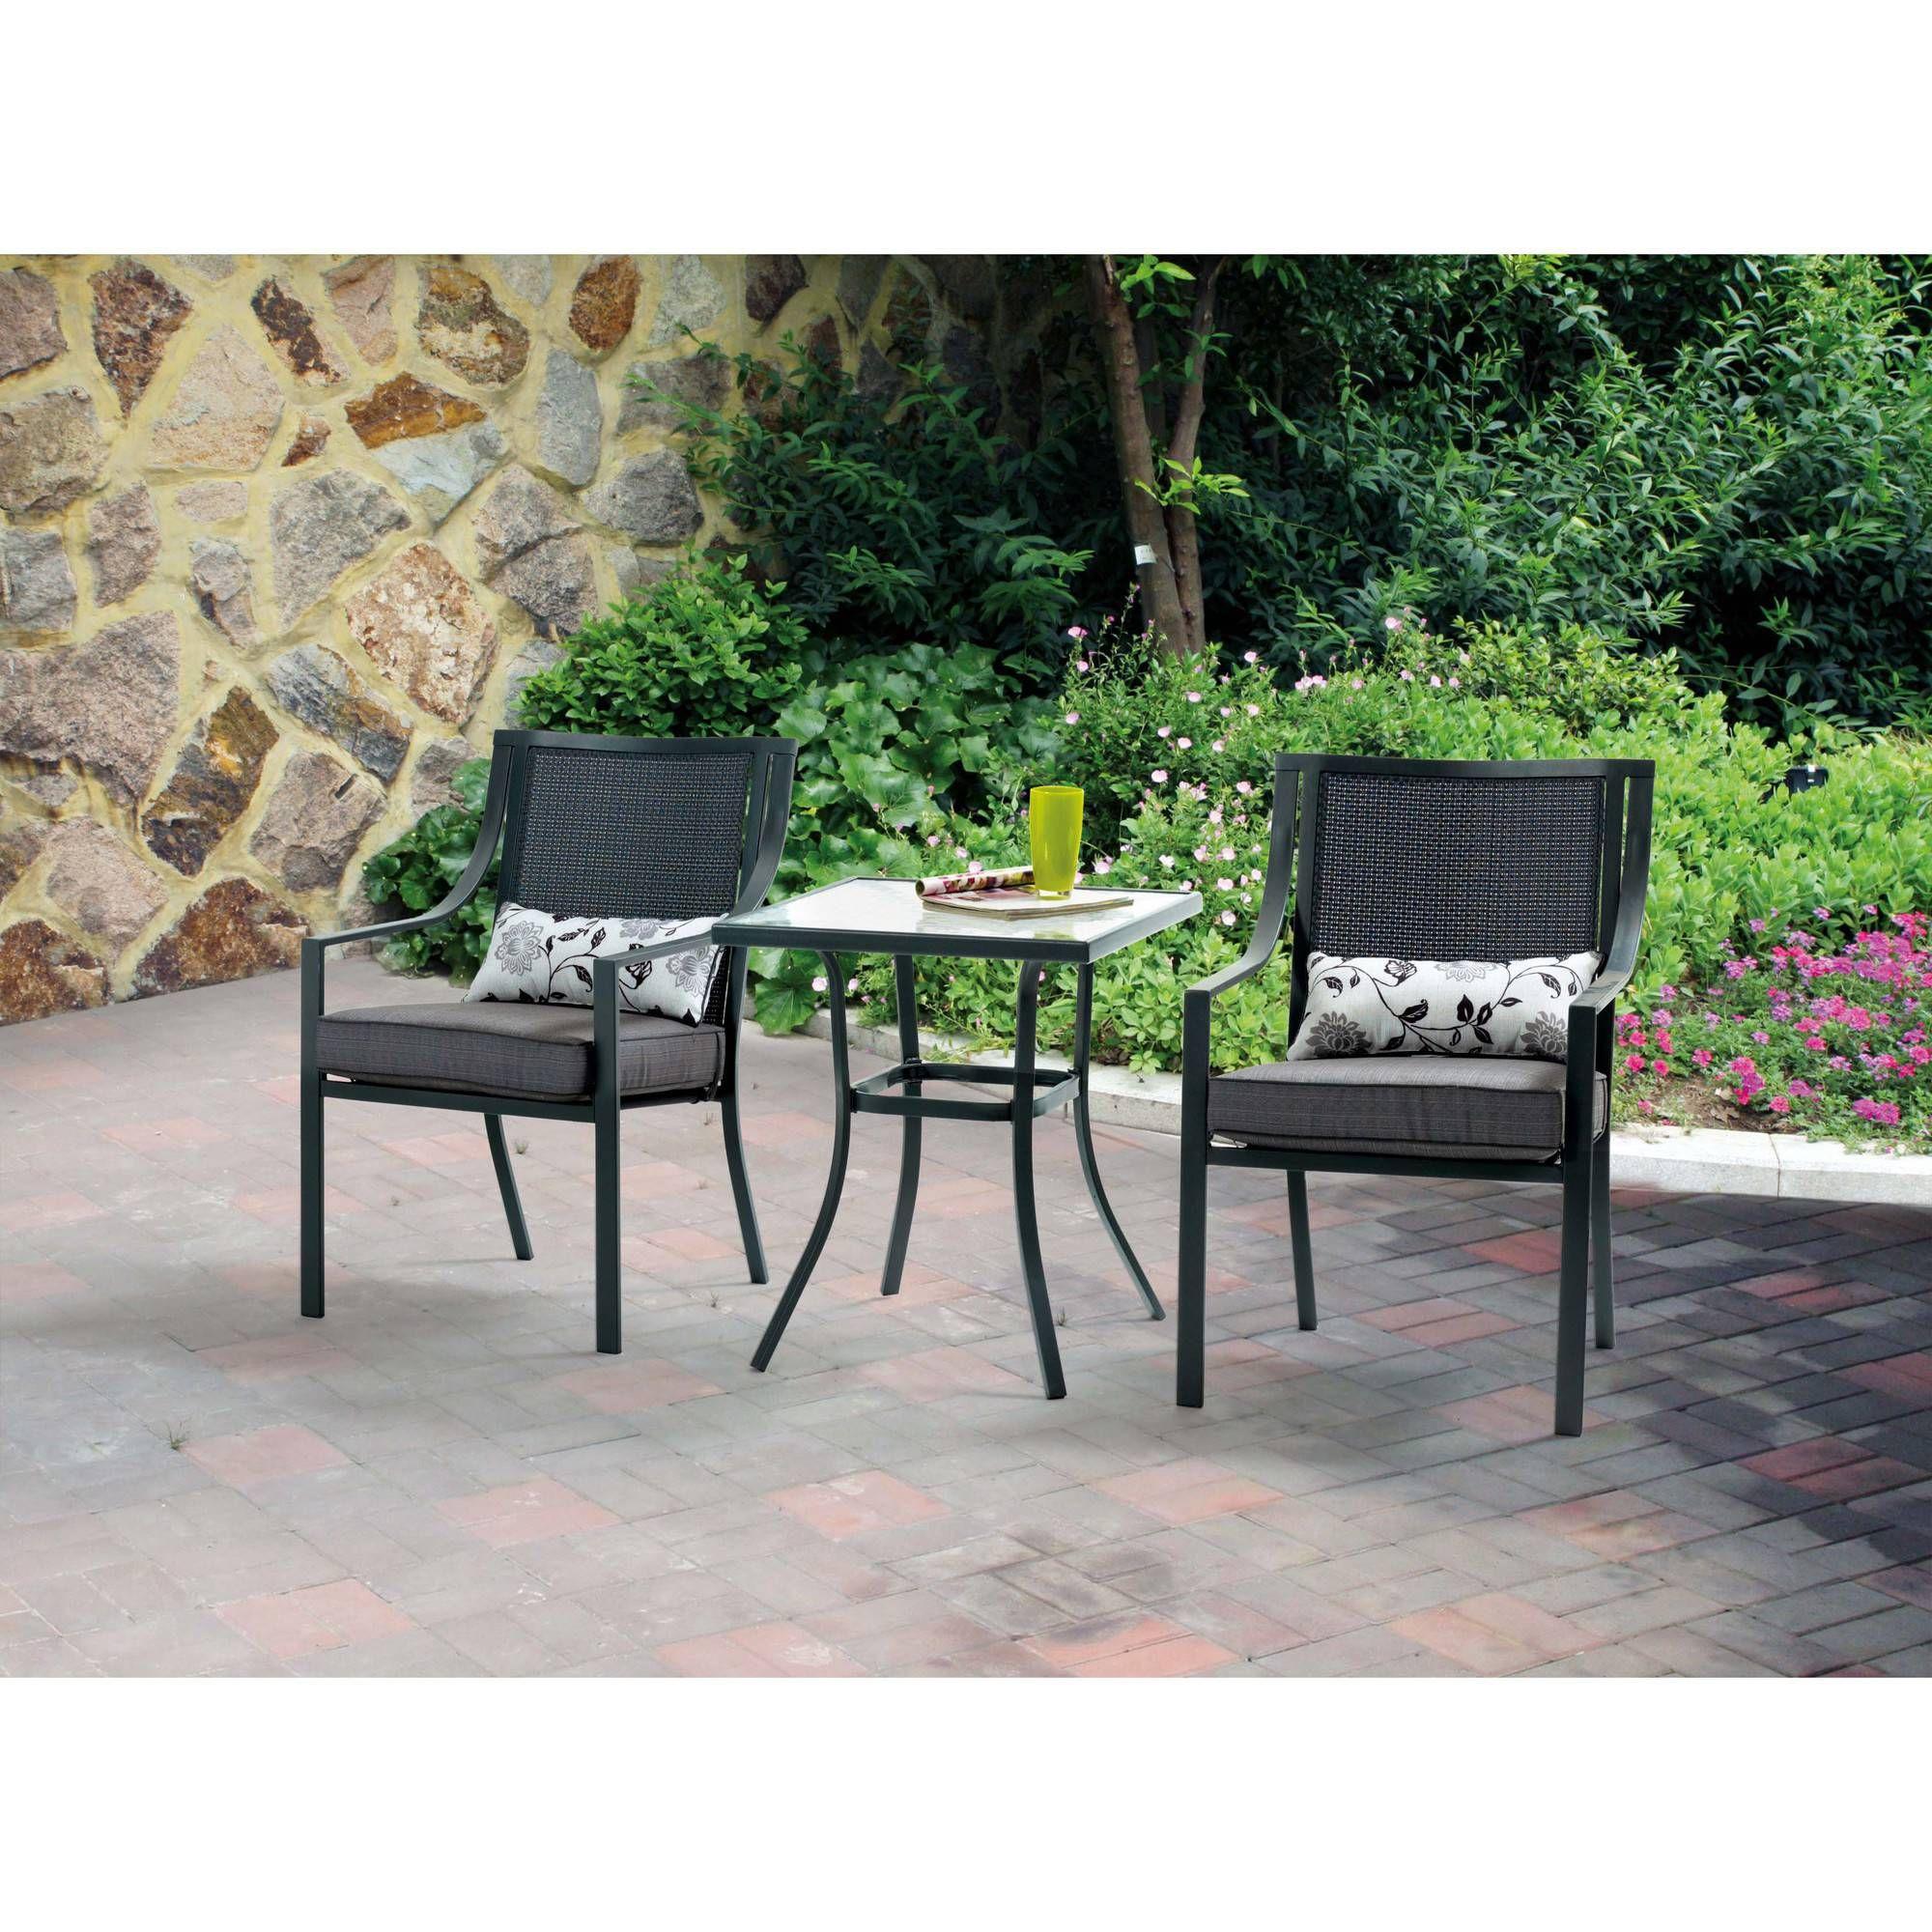 Mainstays Alexandra Square 3 Piece Outdoor Bistro Set Walmart Com Outdoor Bistro Set Outdoor Patio Set Outdoor Patio Table